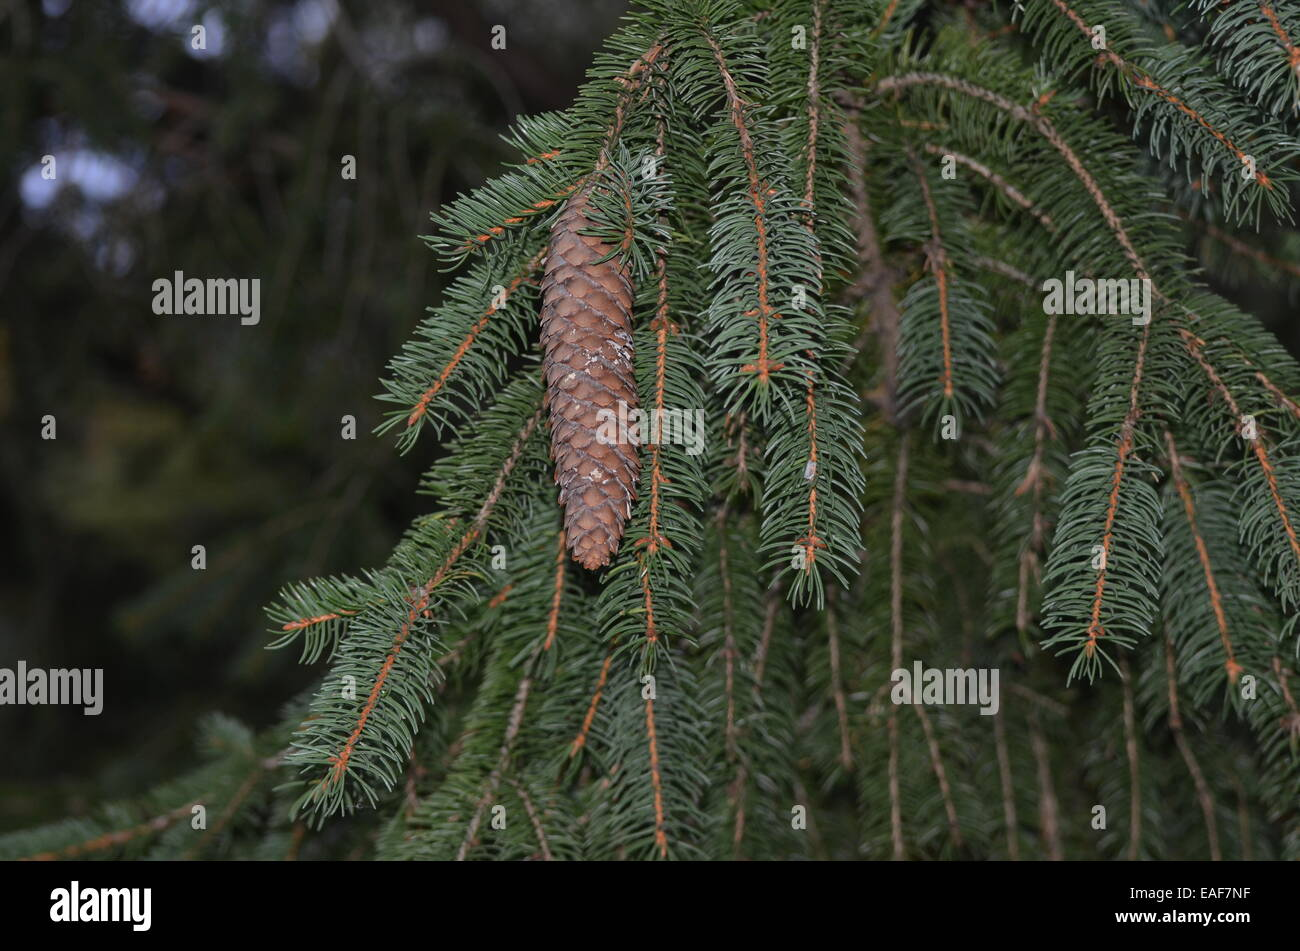 pine cone - Stock Image